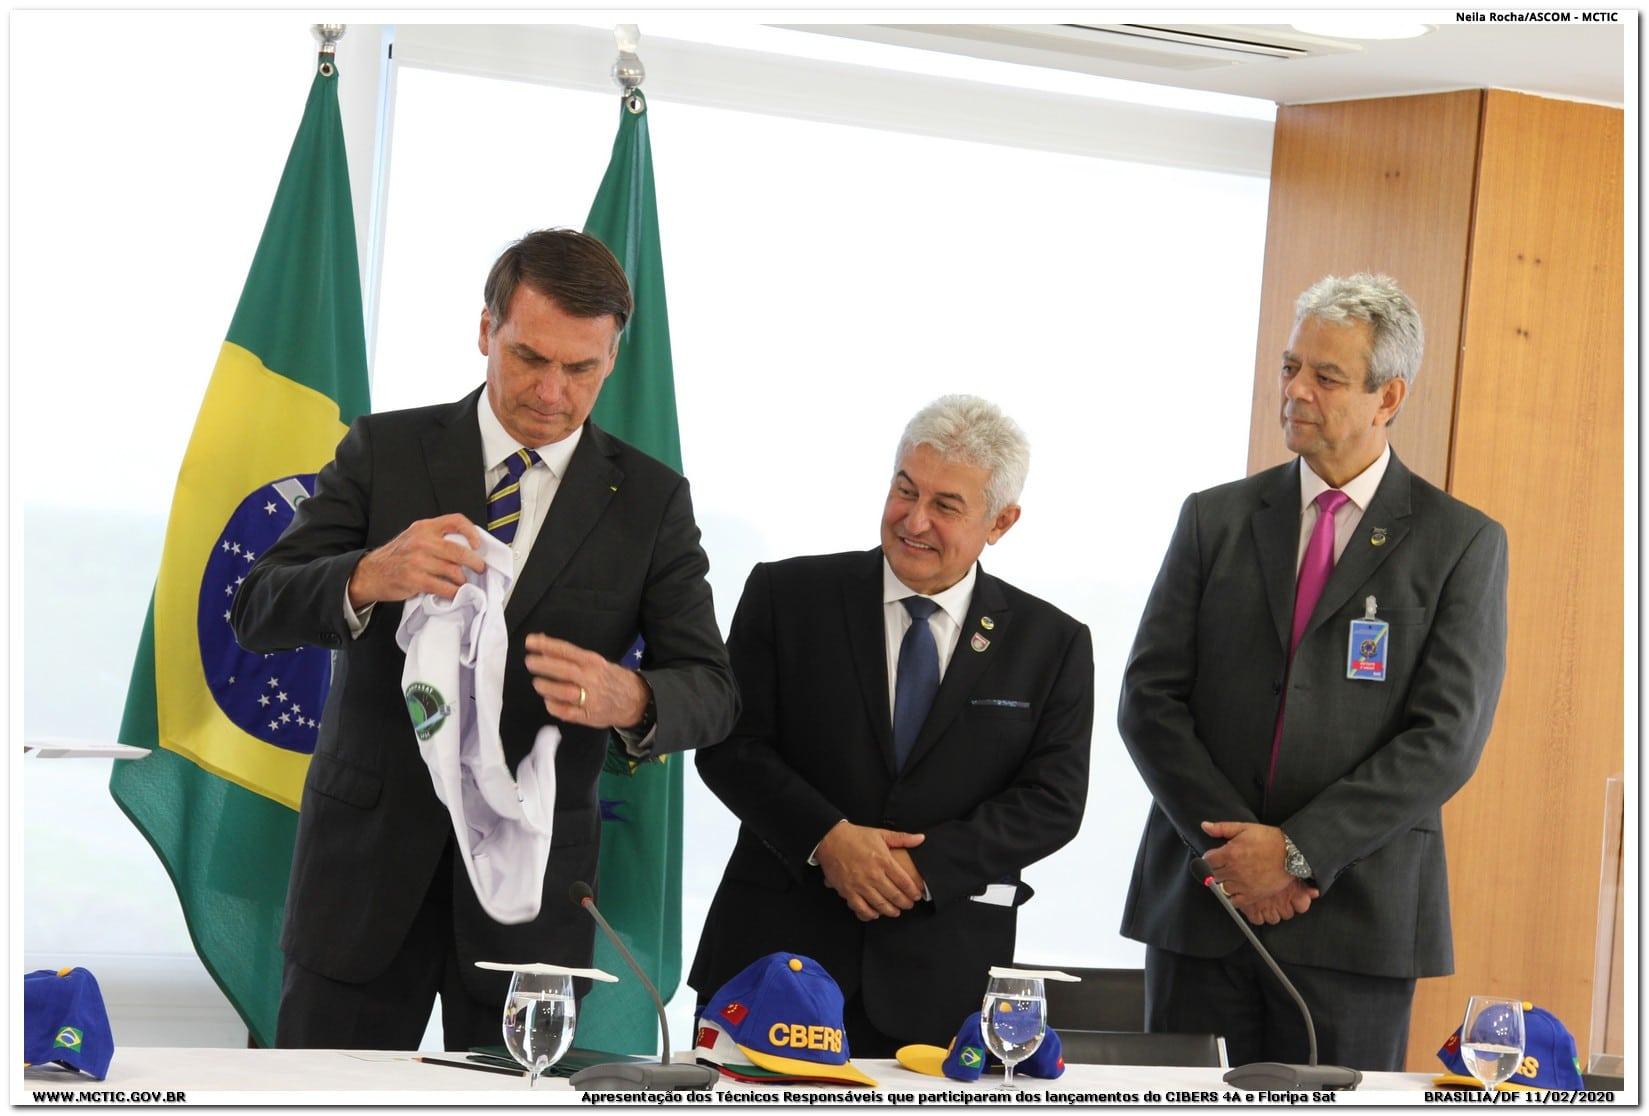 Bolsonaro receives commemorative T-shirt from FloripaSat-1